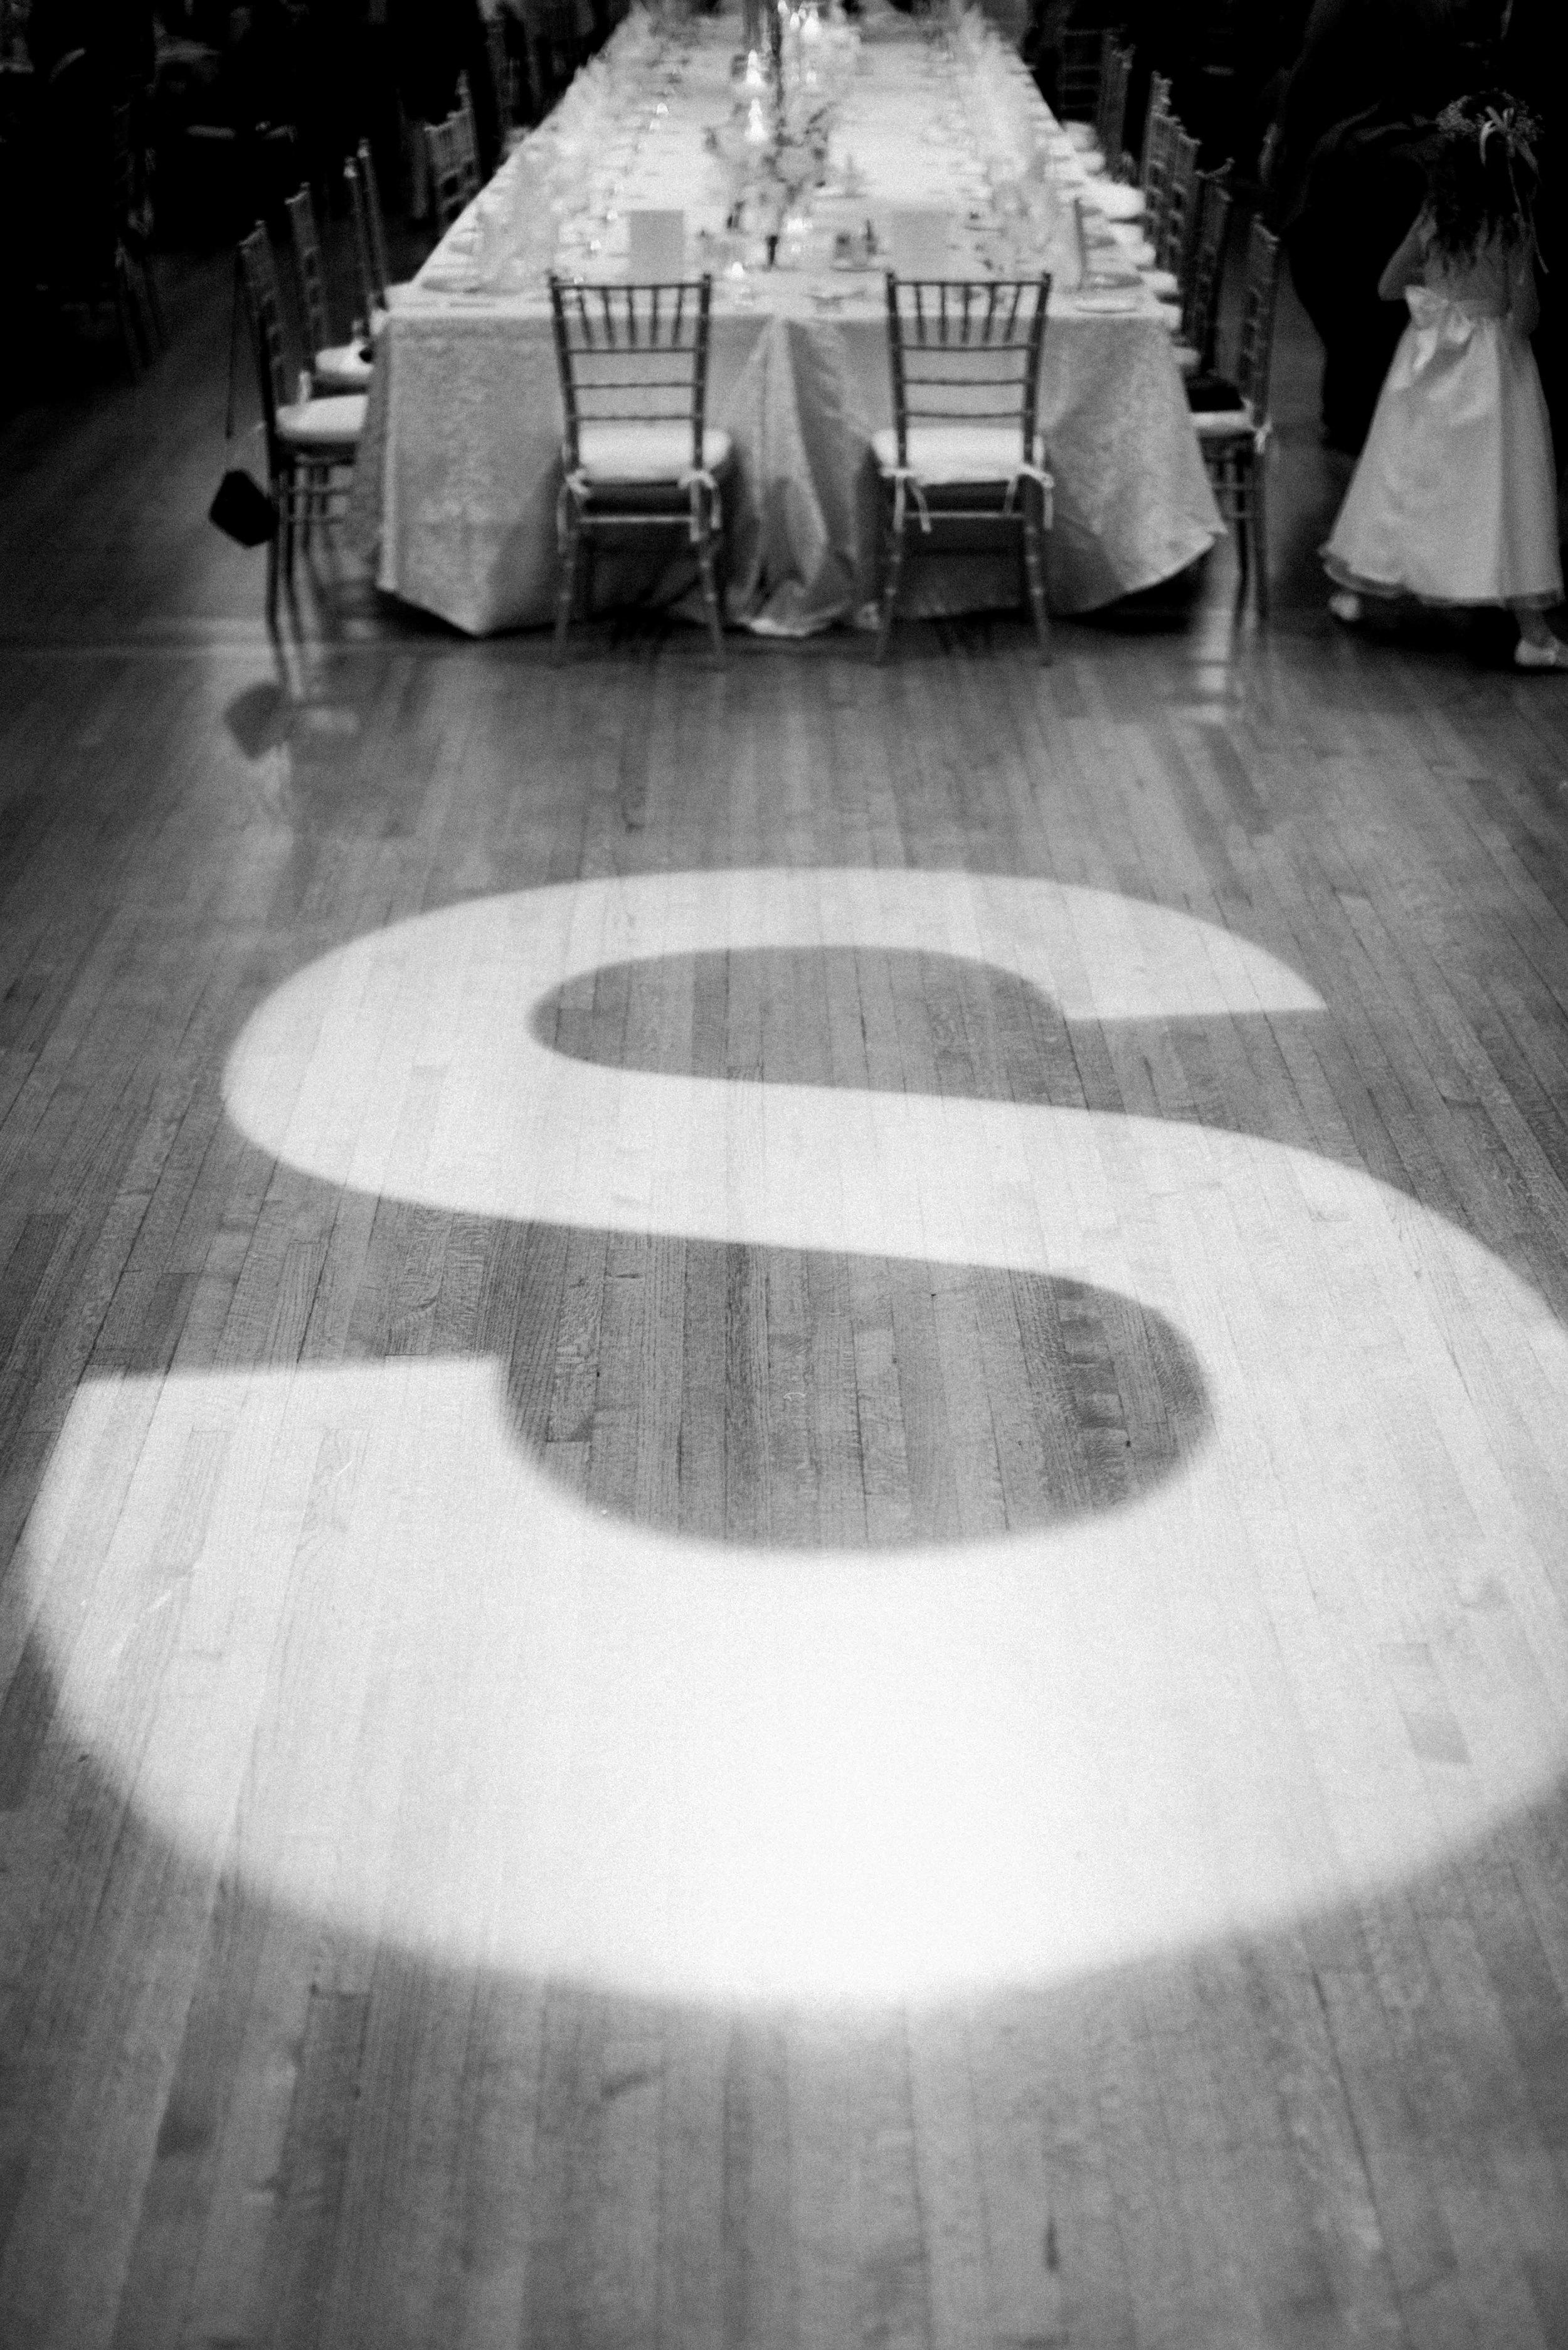 Dana-Fernandez-Photography-Weddings-in-Houston-Magazine-feature-Houston-wedding-photographer-film-40.jpg